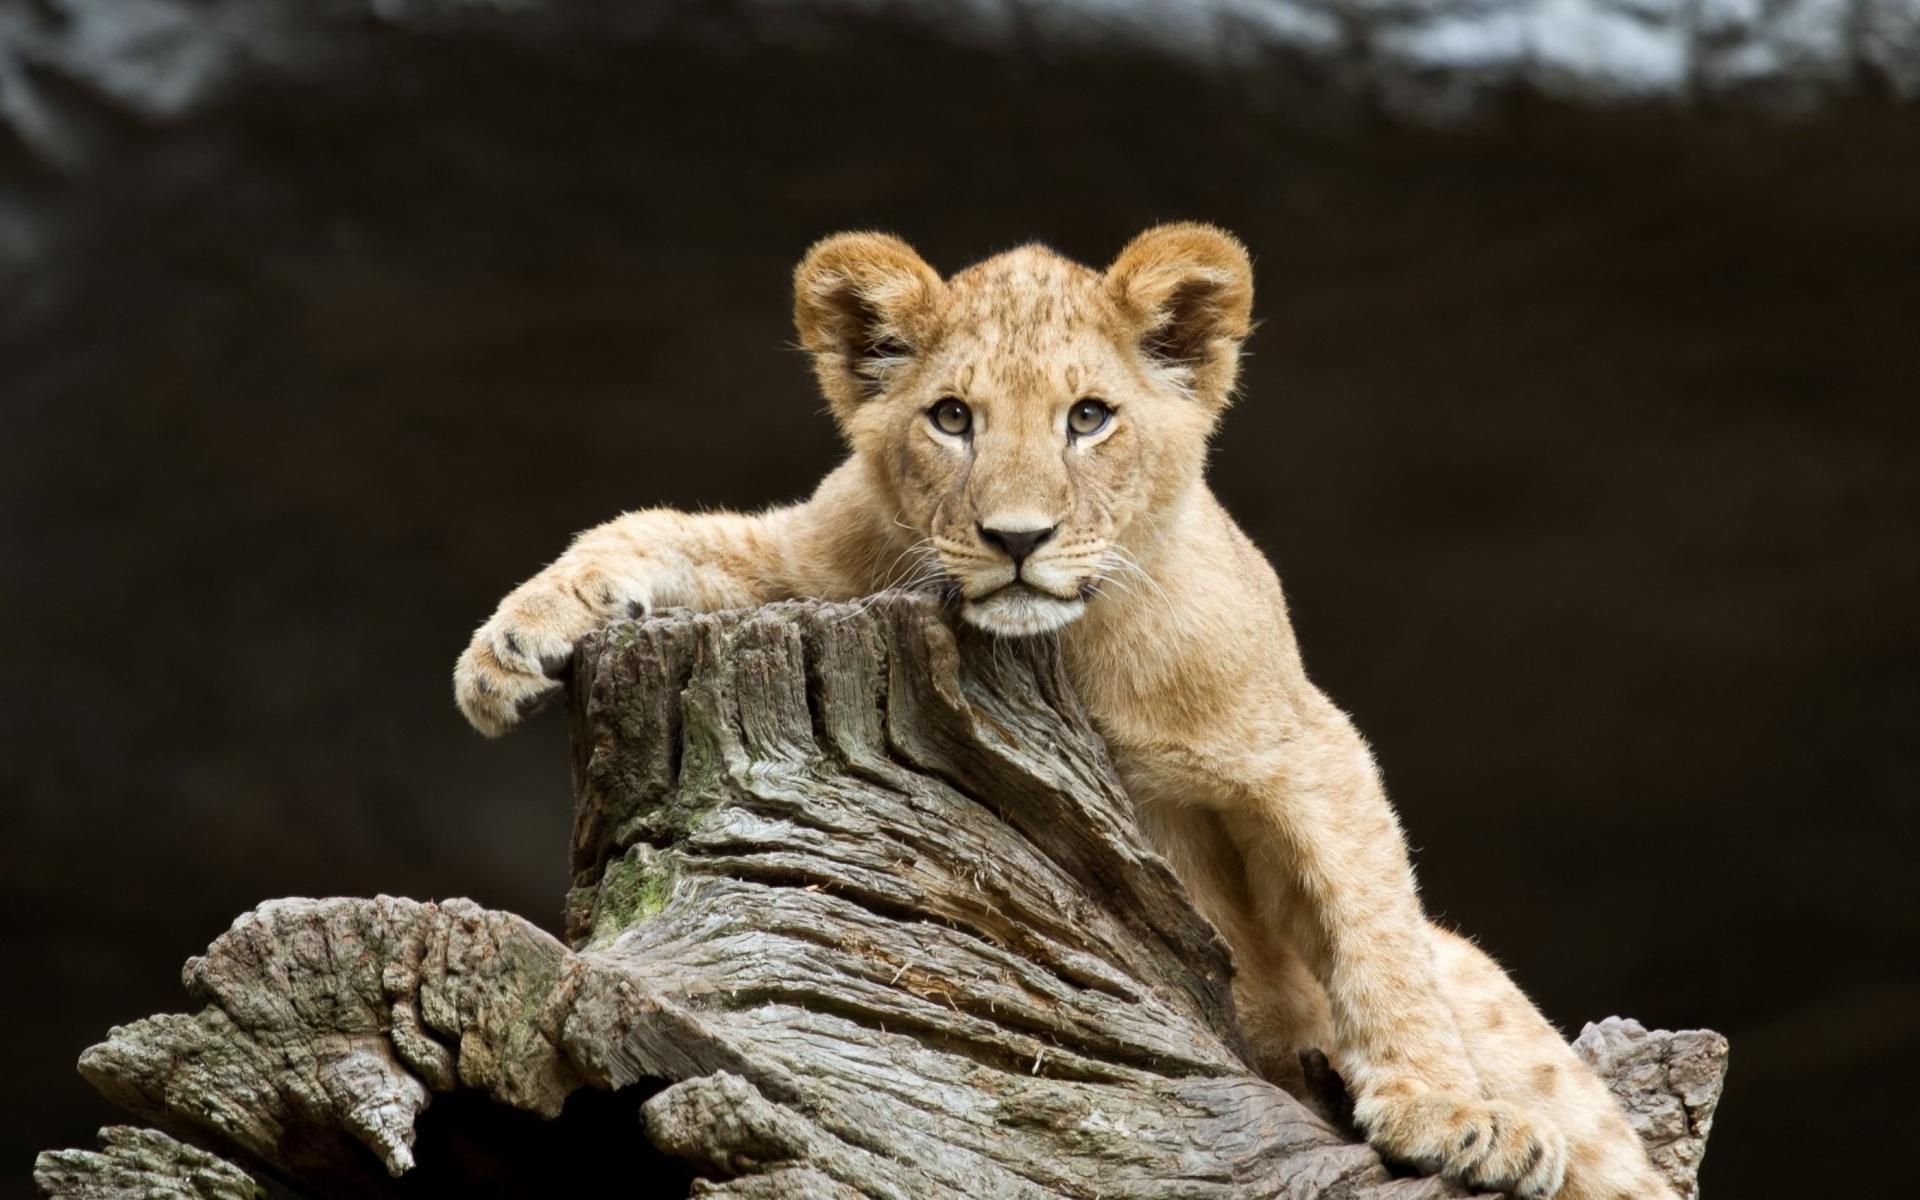 Cute Lion Cubs Hd Wallpapers 와이드 스크린 아기 사자는 육식 동물 야생 동물 얼굴 눈을 Pov 1080p의 Hd 벽지 새끼